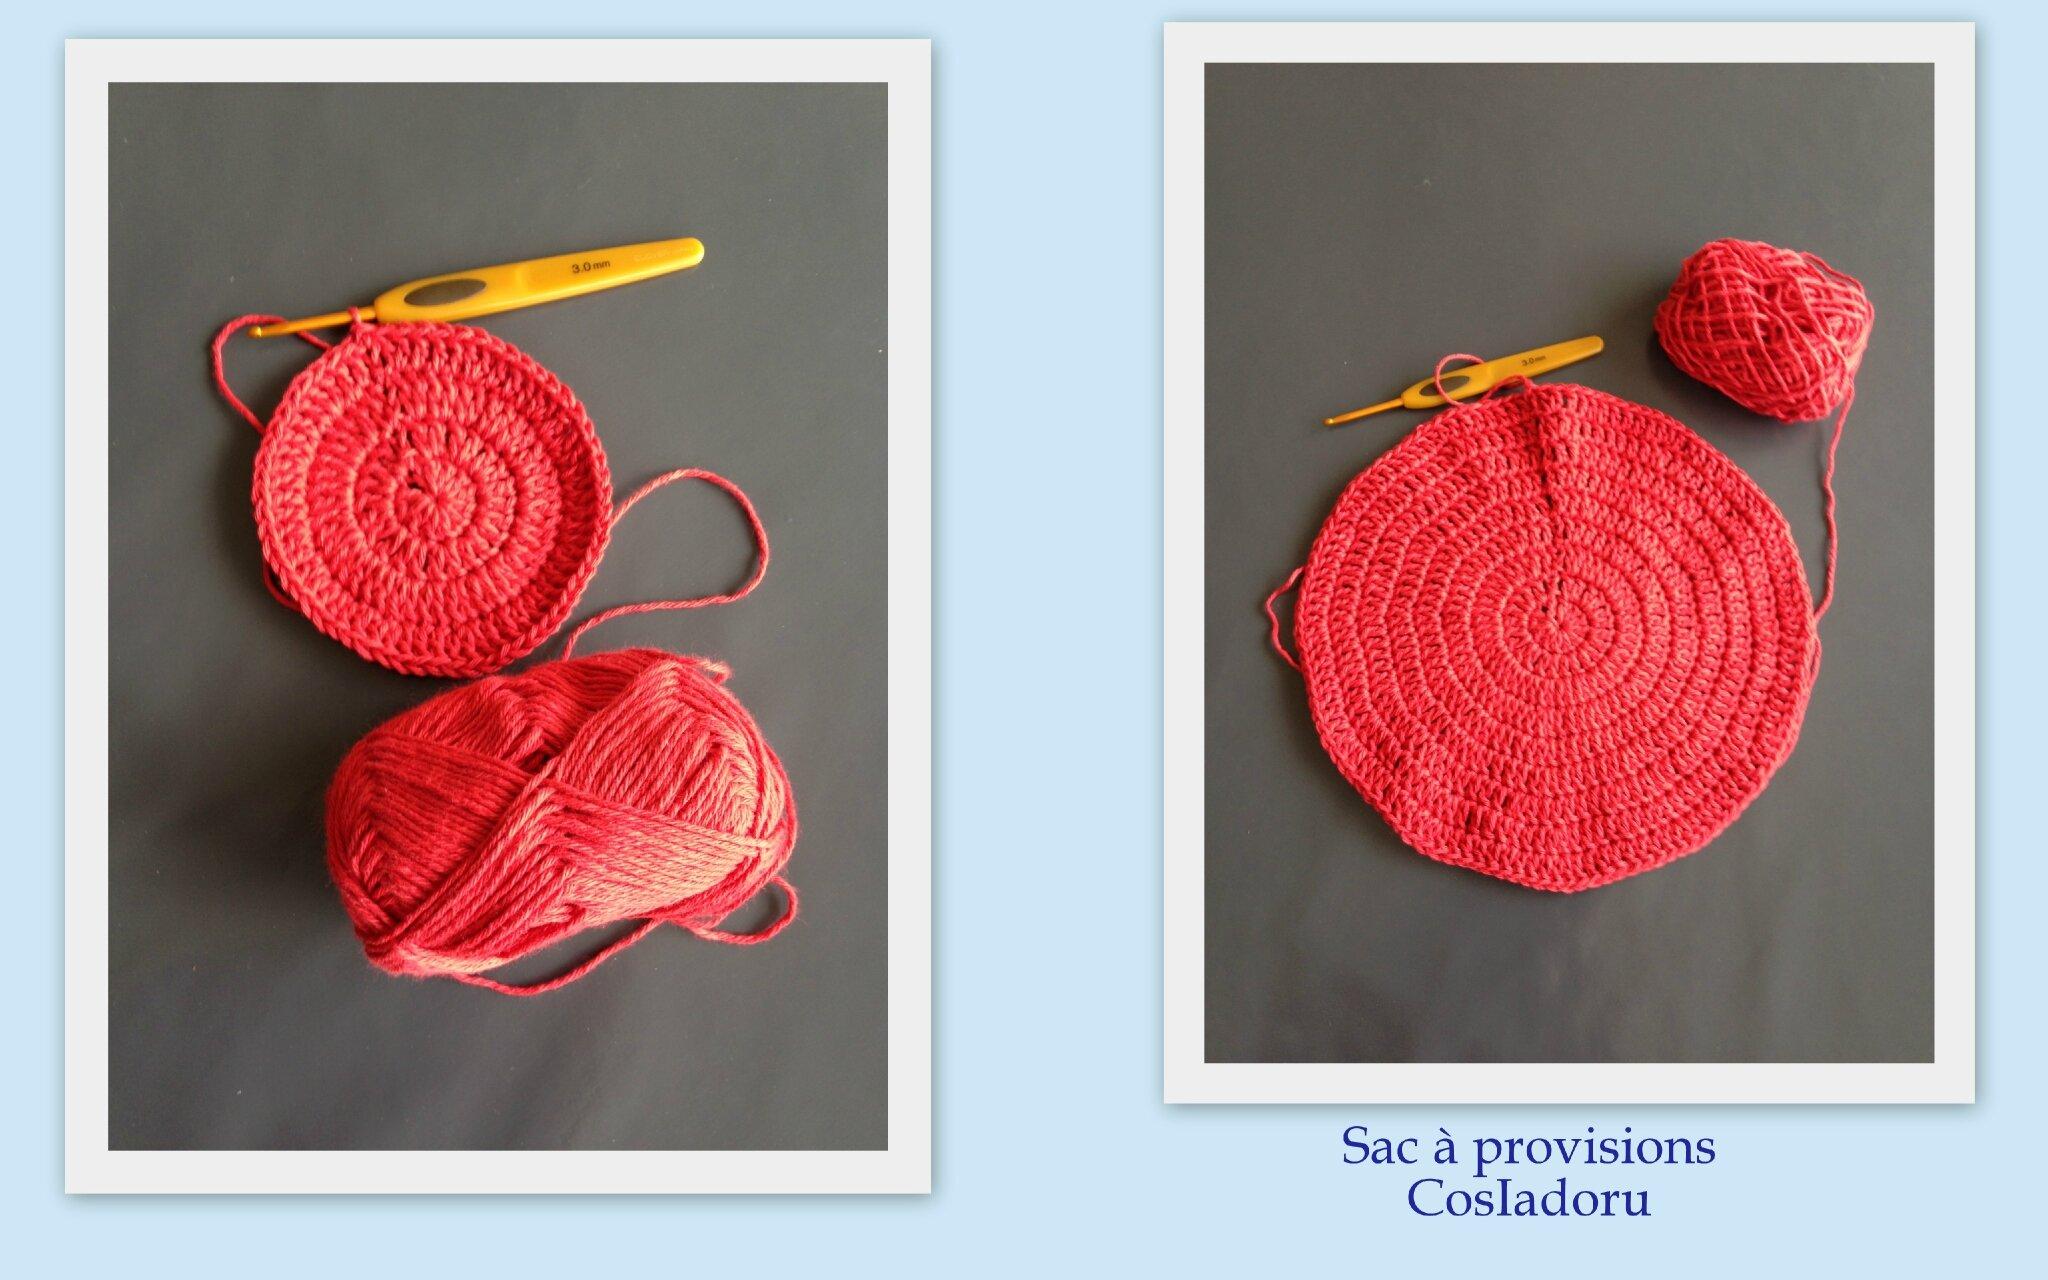 Sac filet provisions au crochet cosiadoru - Tuto pour creer un sac en crochet ...